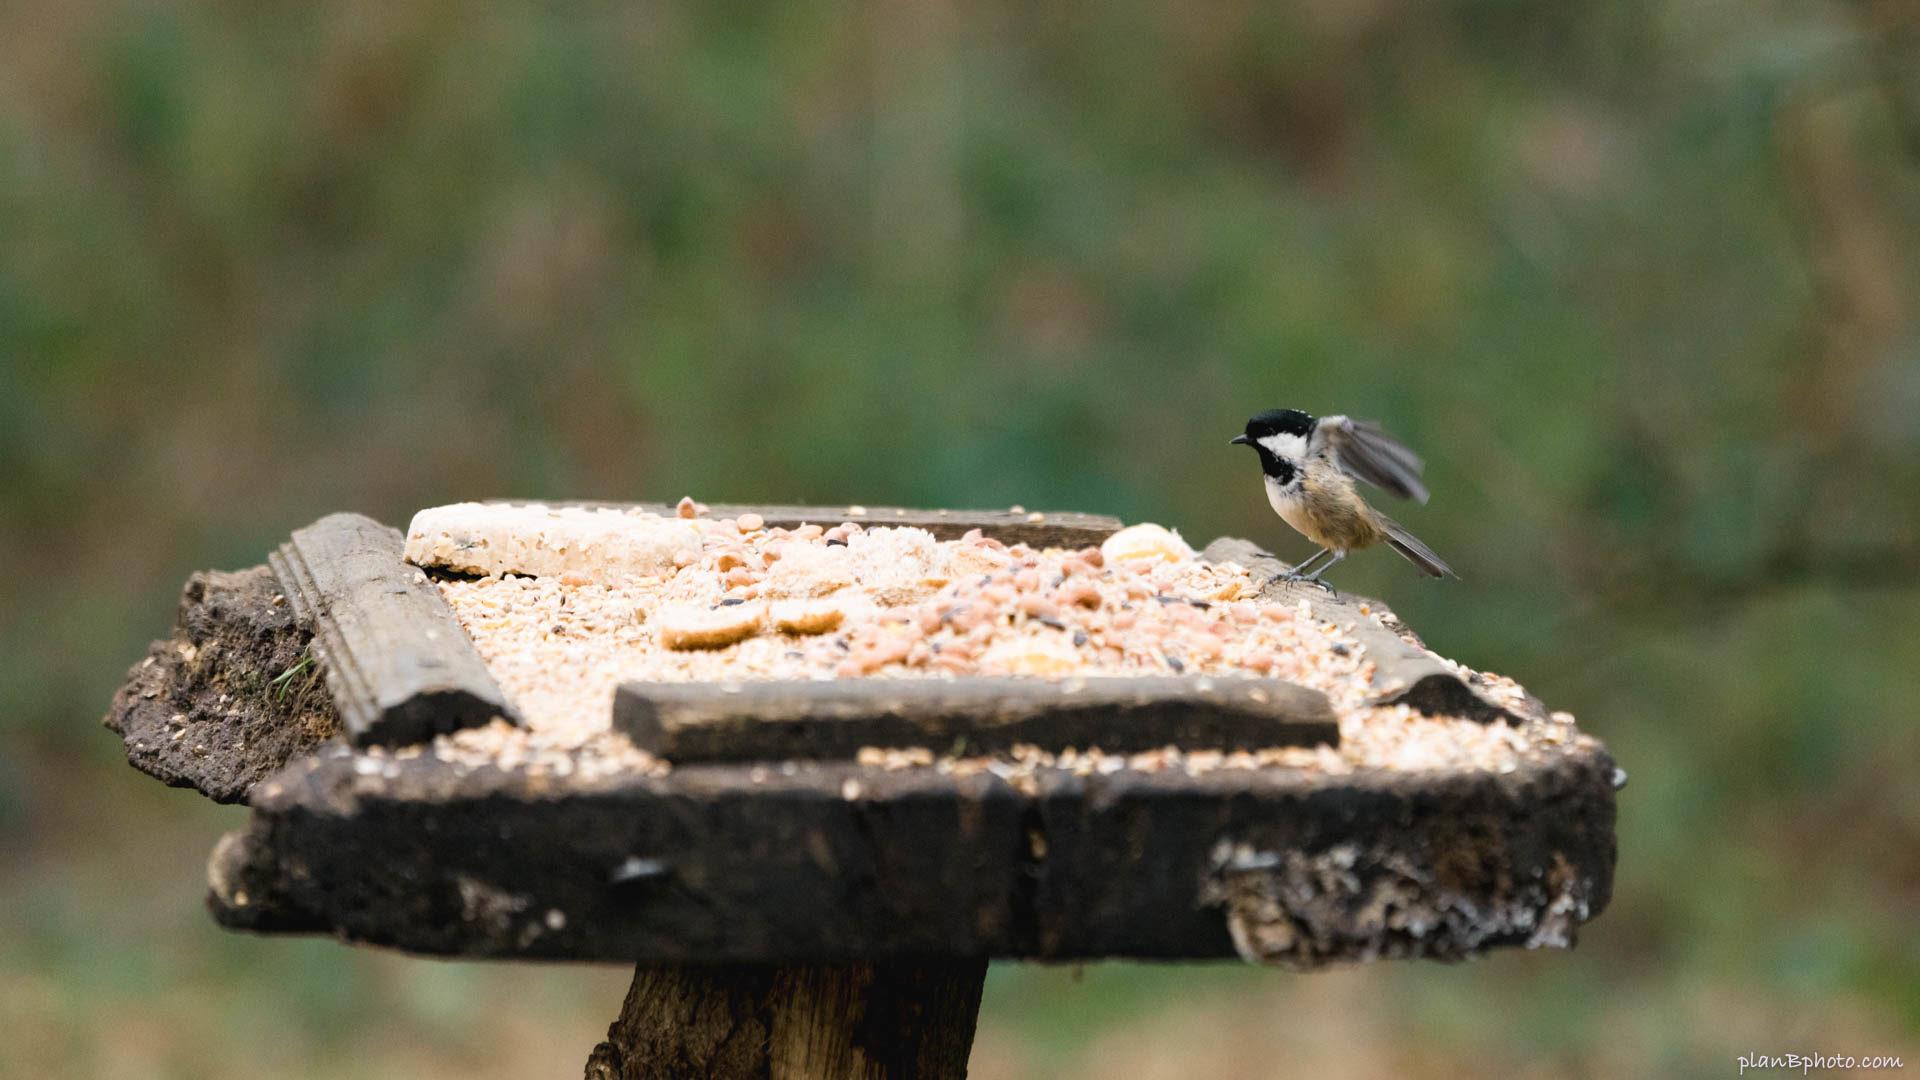 Bird on a bird feeder